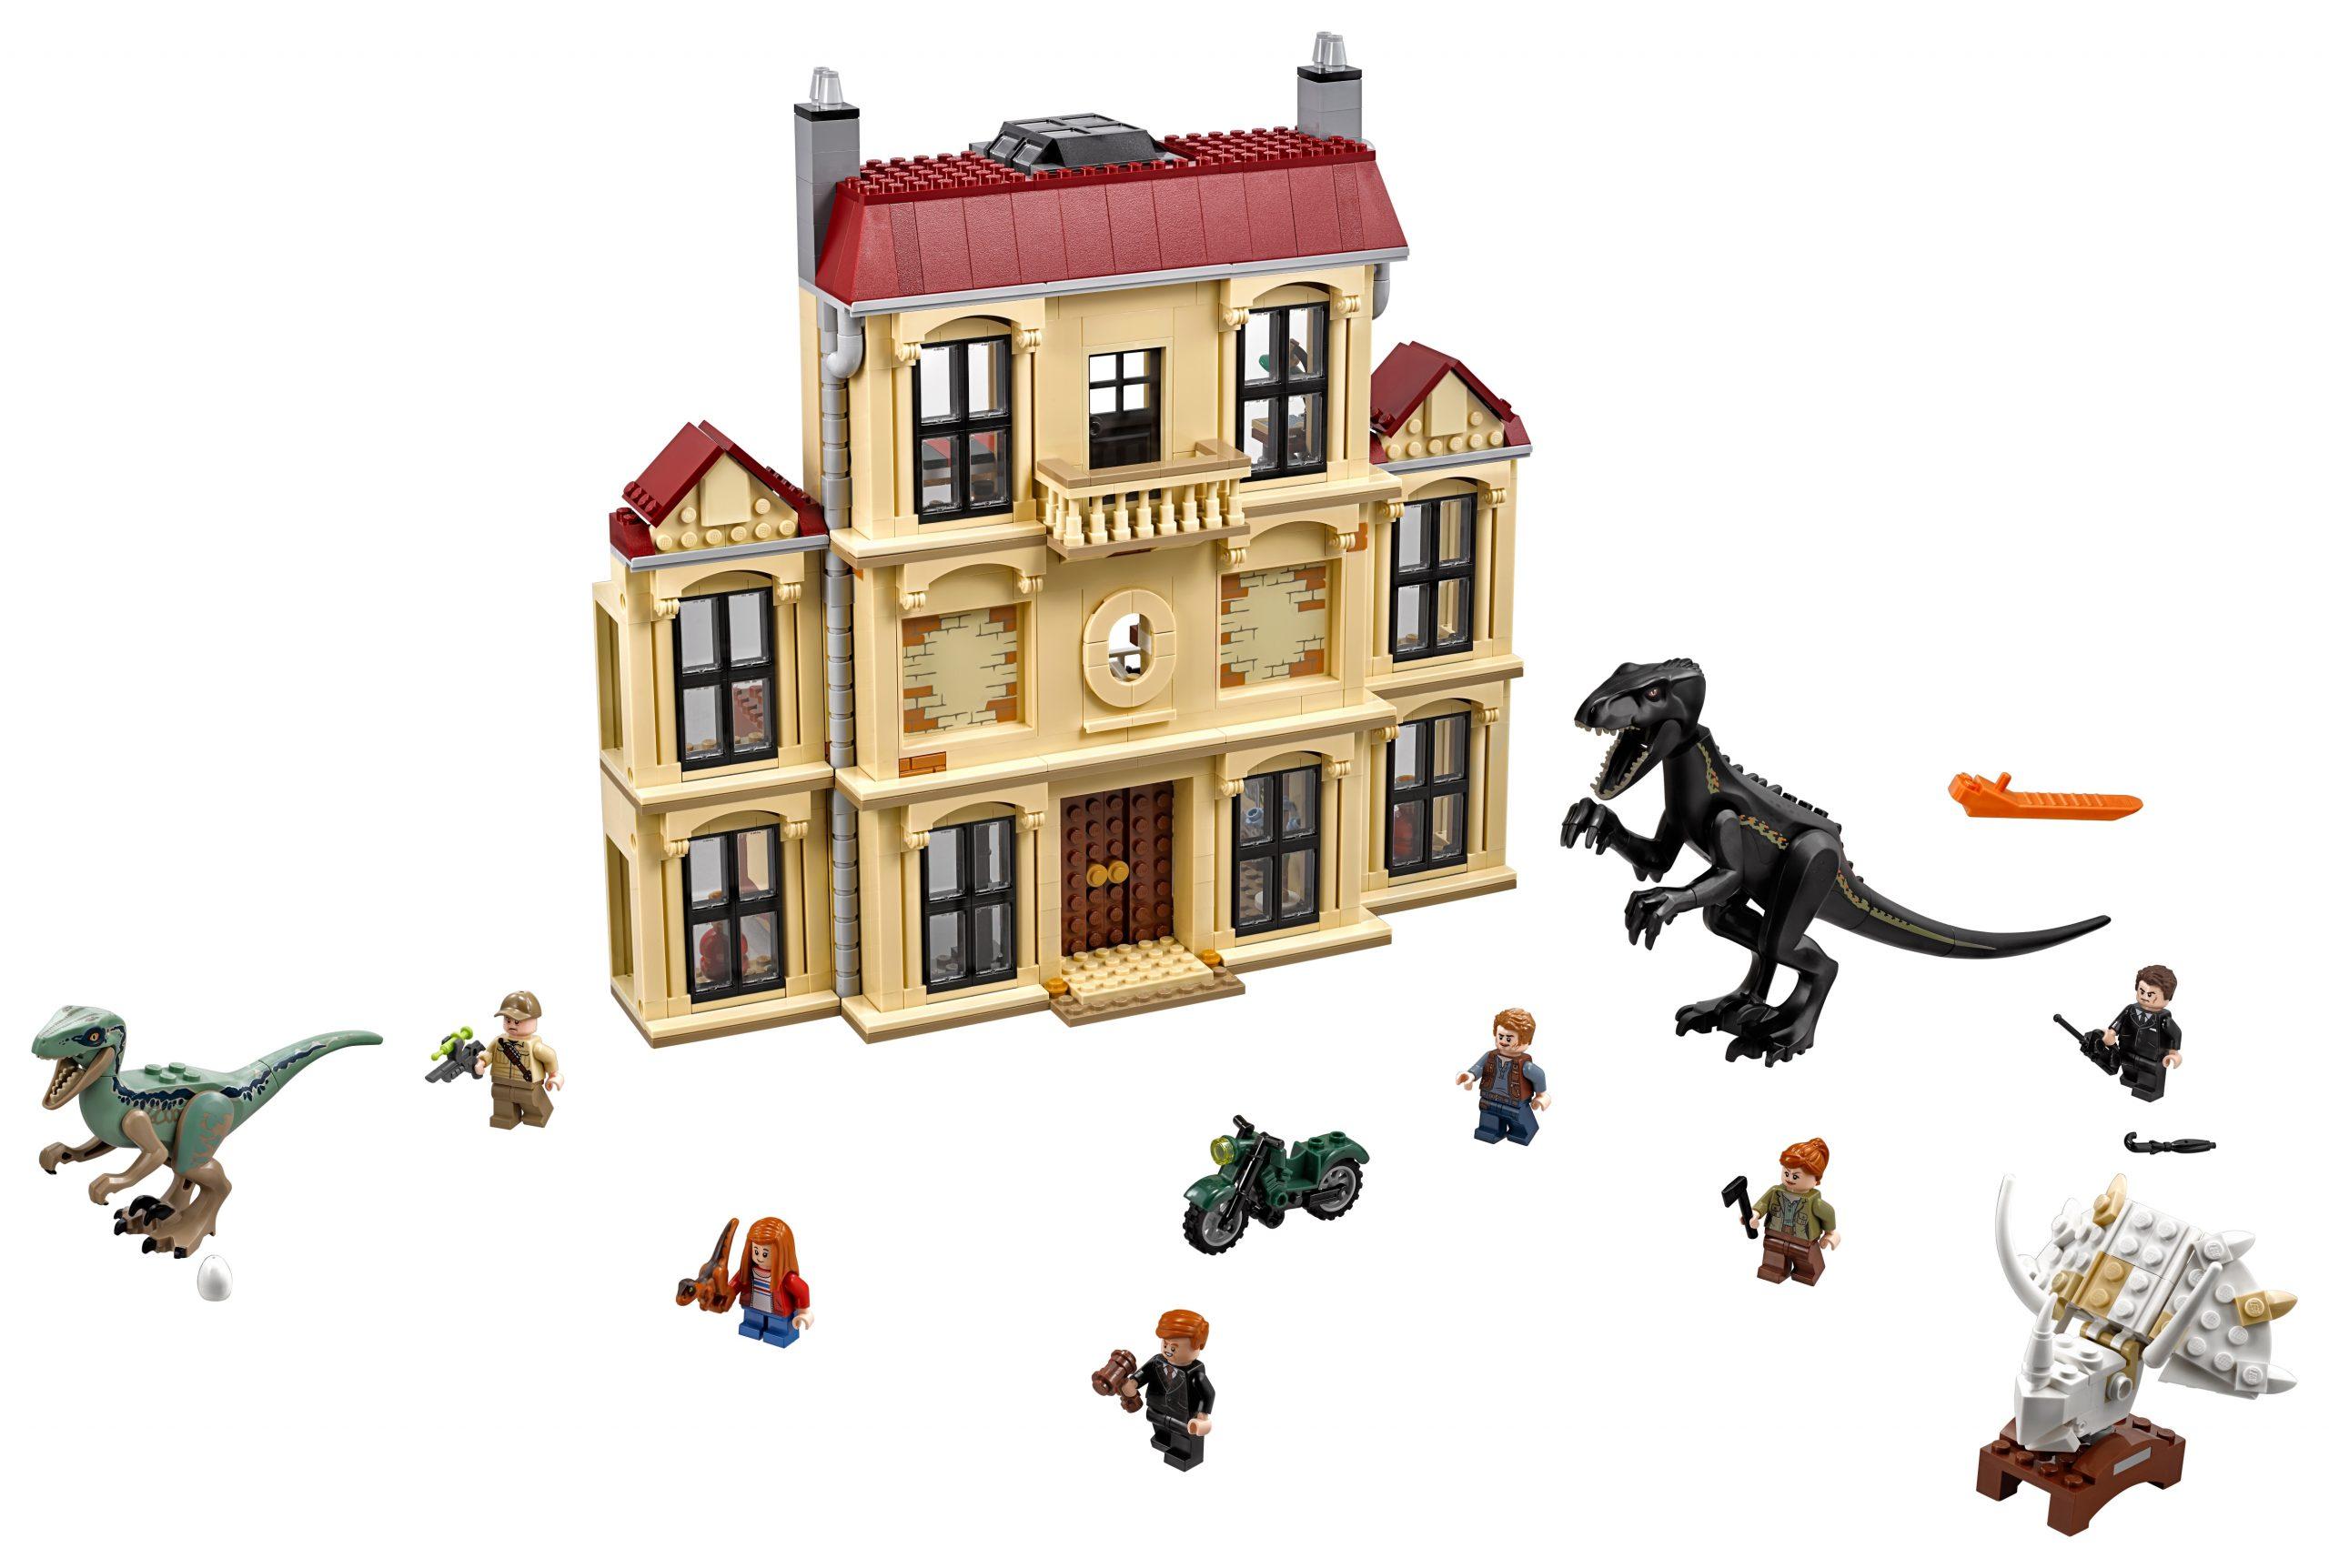 lego indoraptorchaos bij lockwood estate 75930 scaled